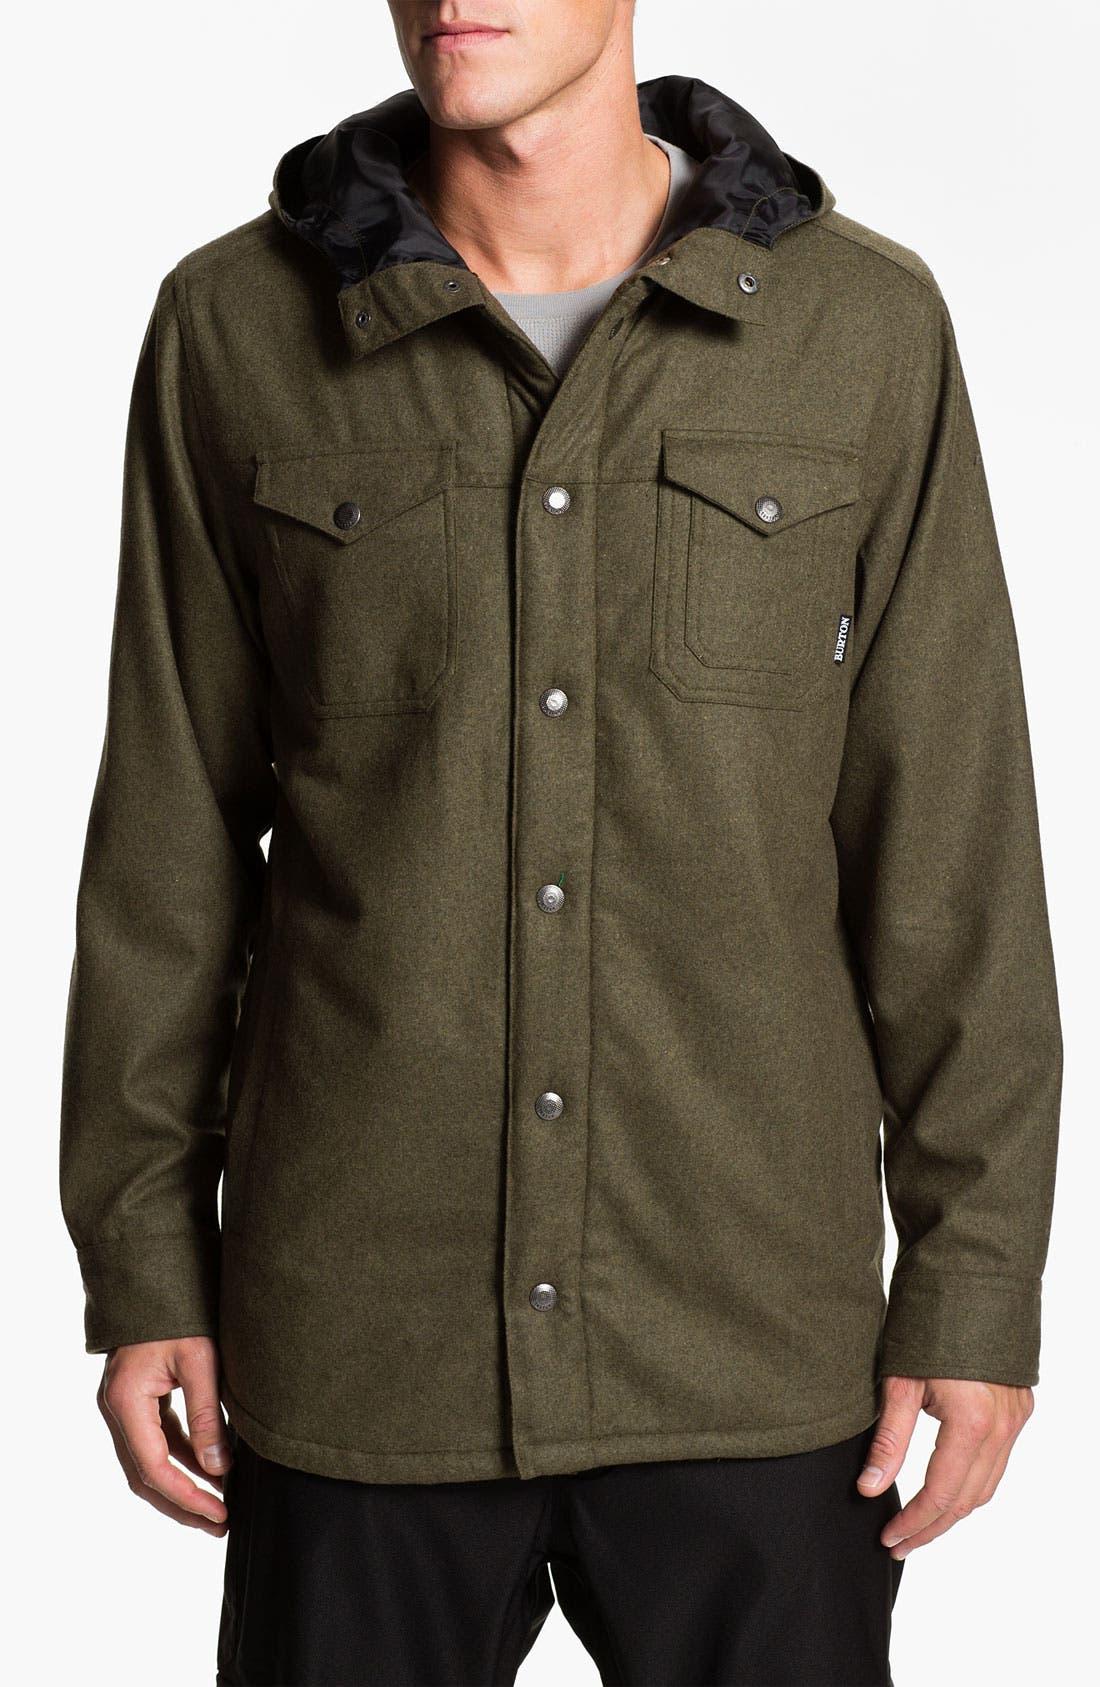 Alternate Image 1 Selected - Burton 'Nelson' Hooded Woven Jacket